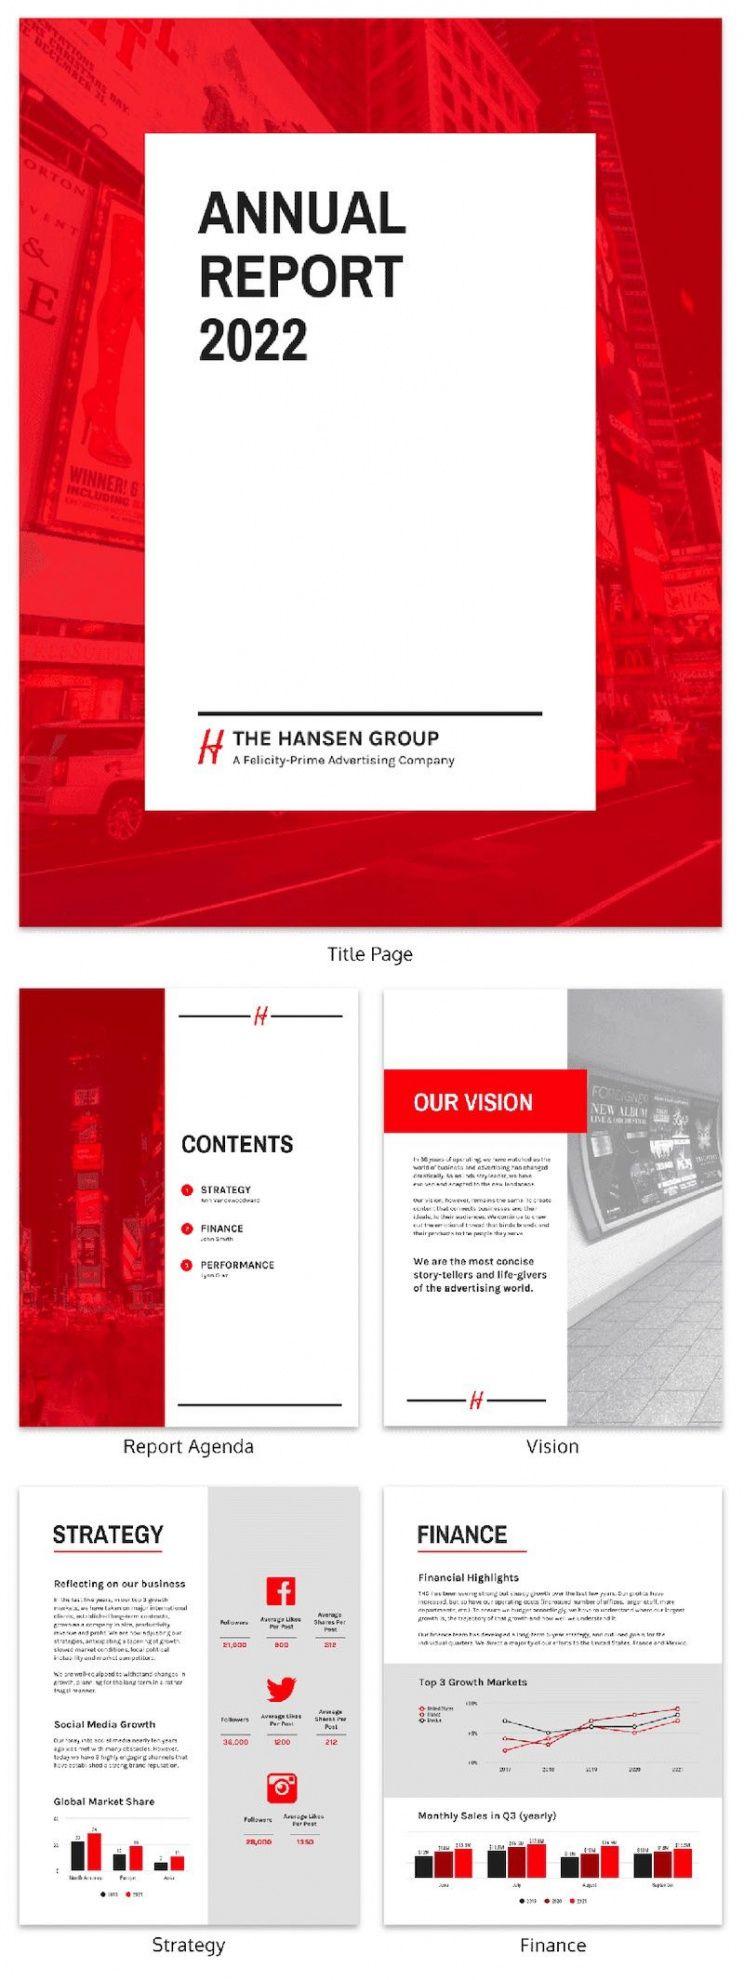 sample 55 annual report design templates & inspirational examples online annual report template example